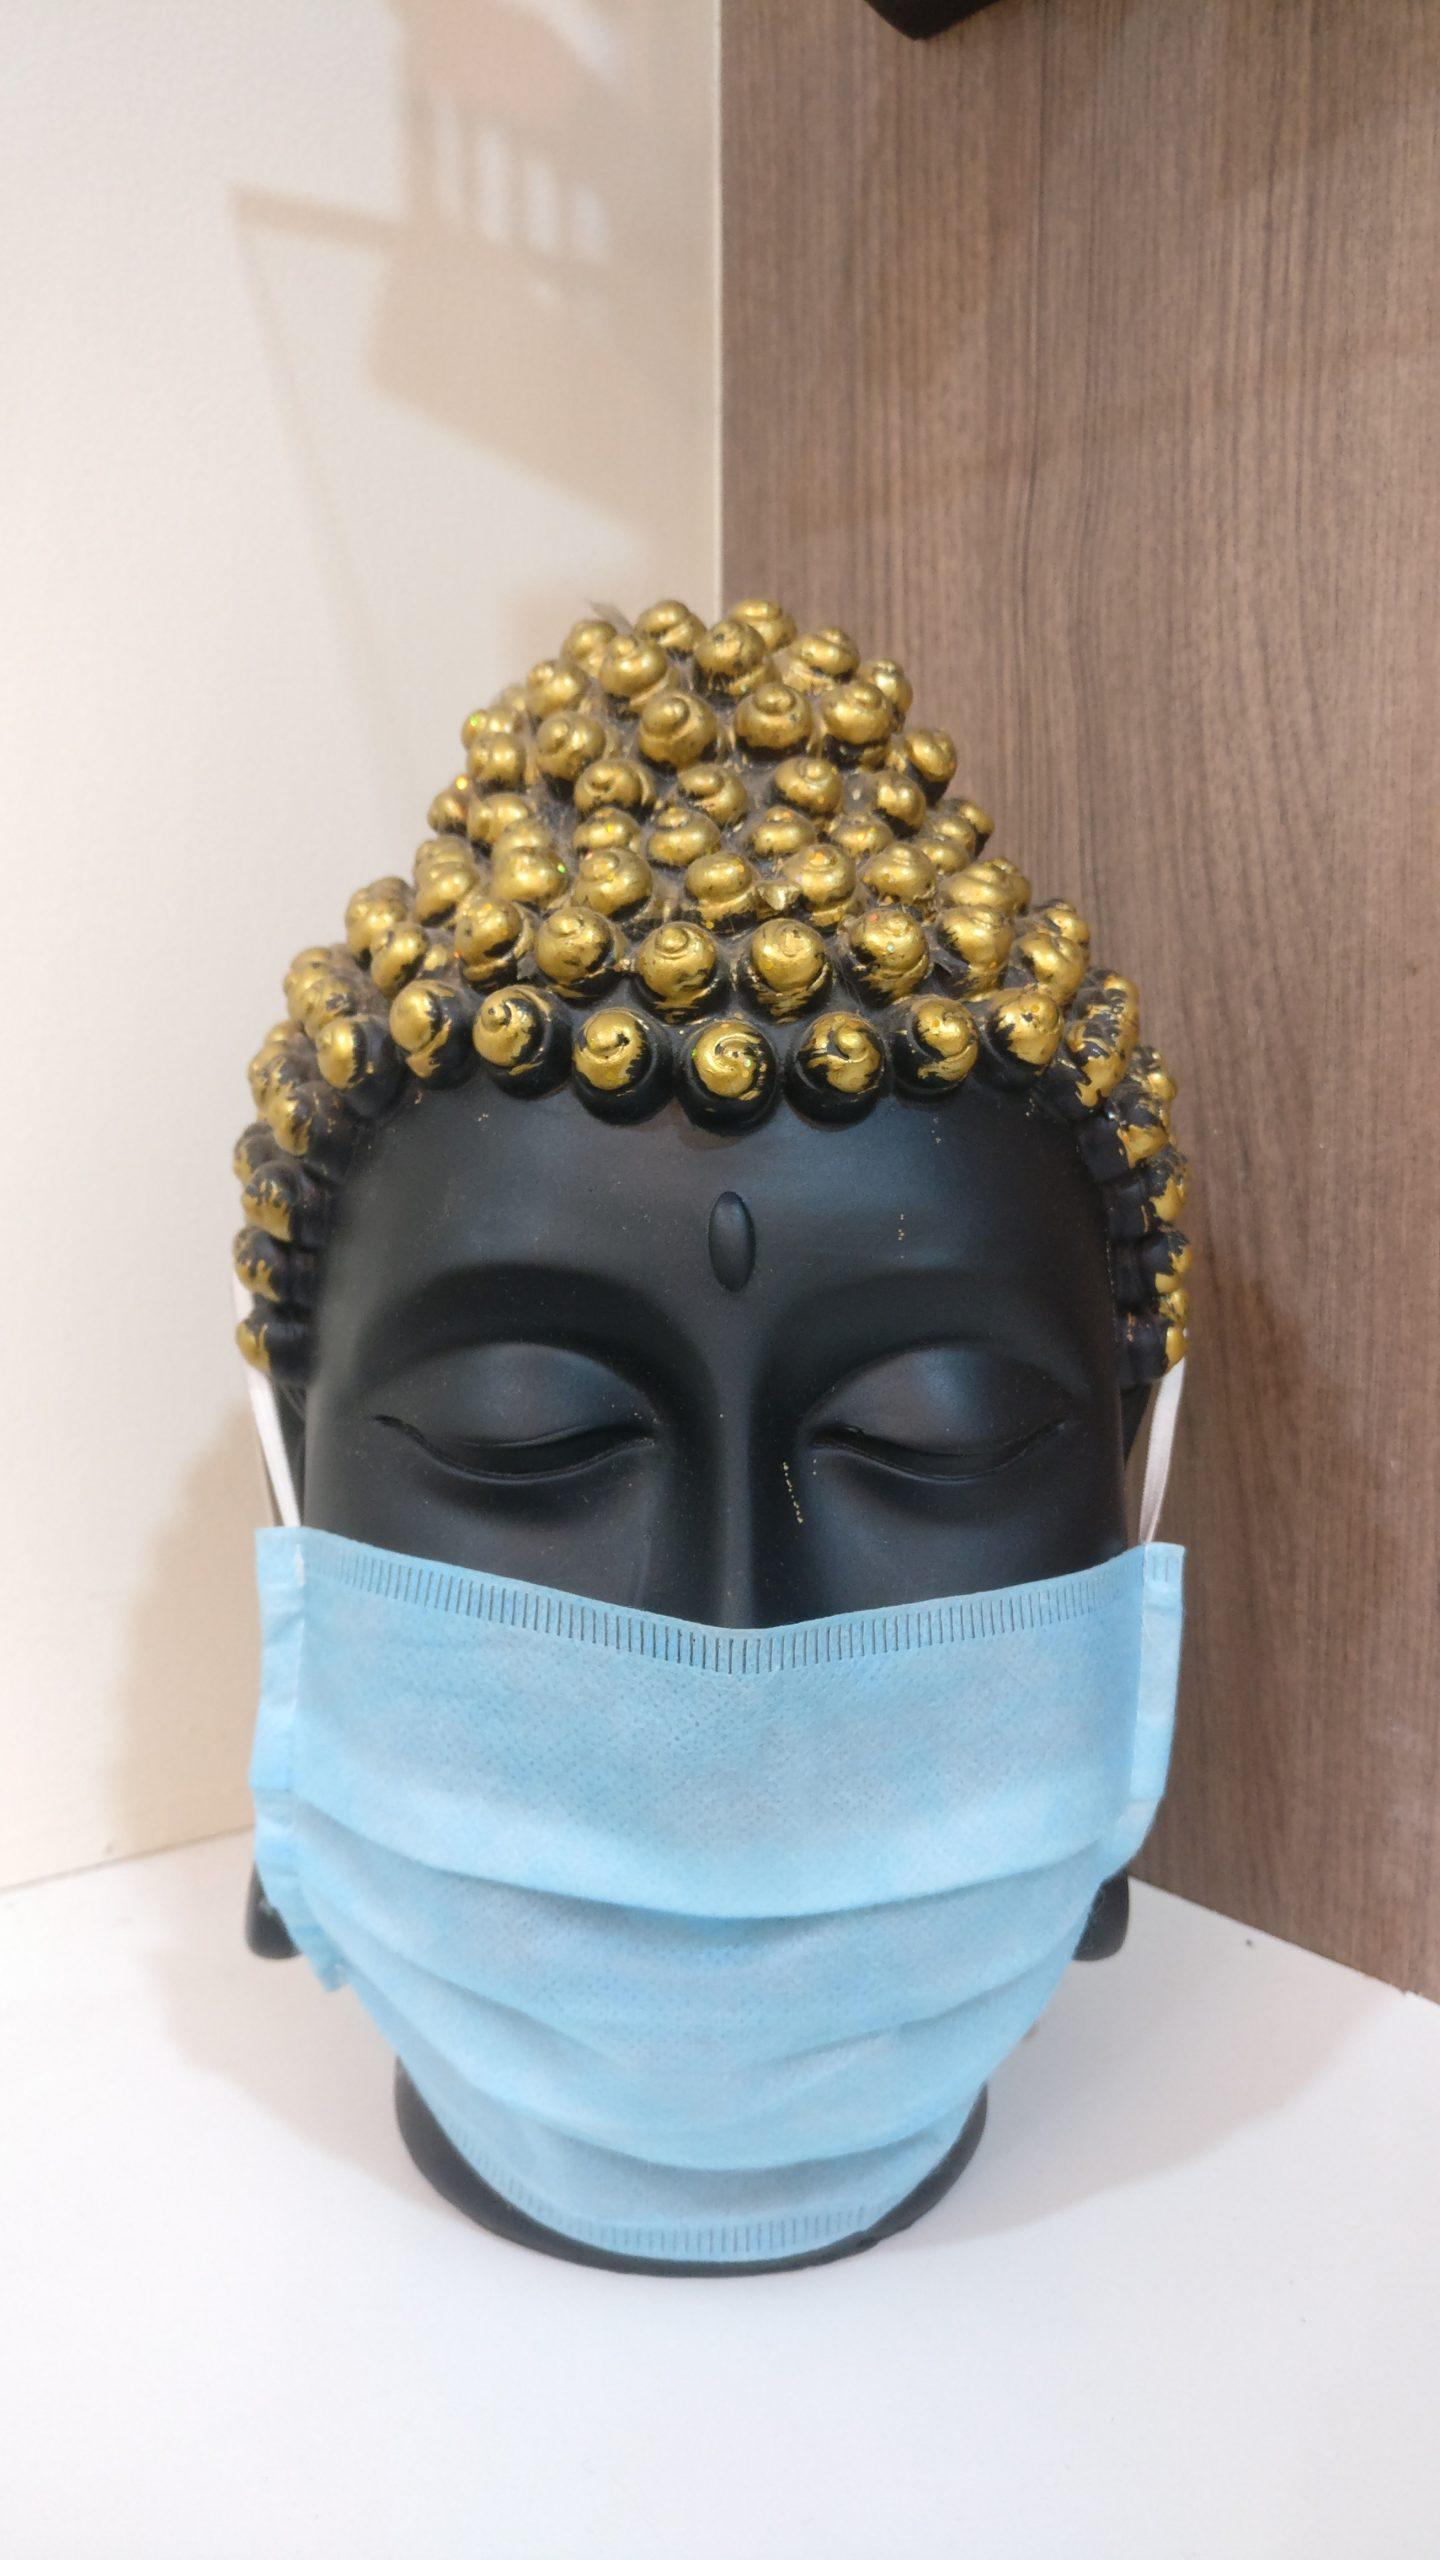 Buddha head statue with mask